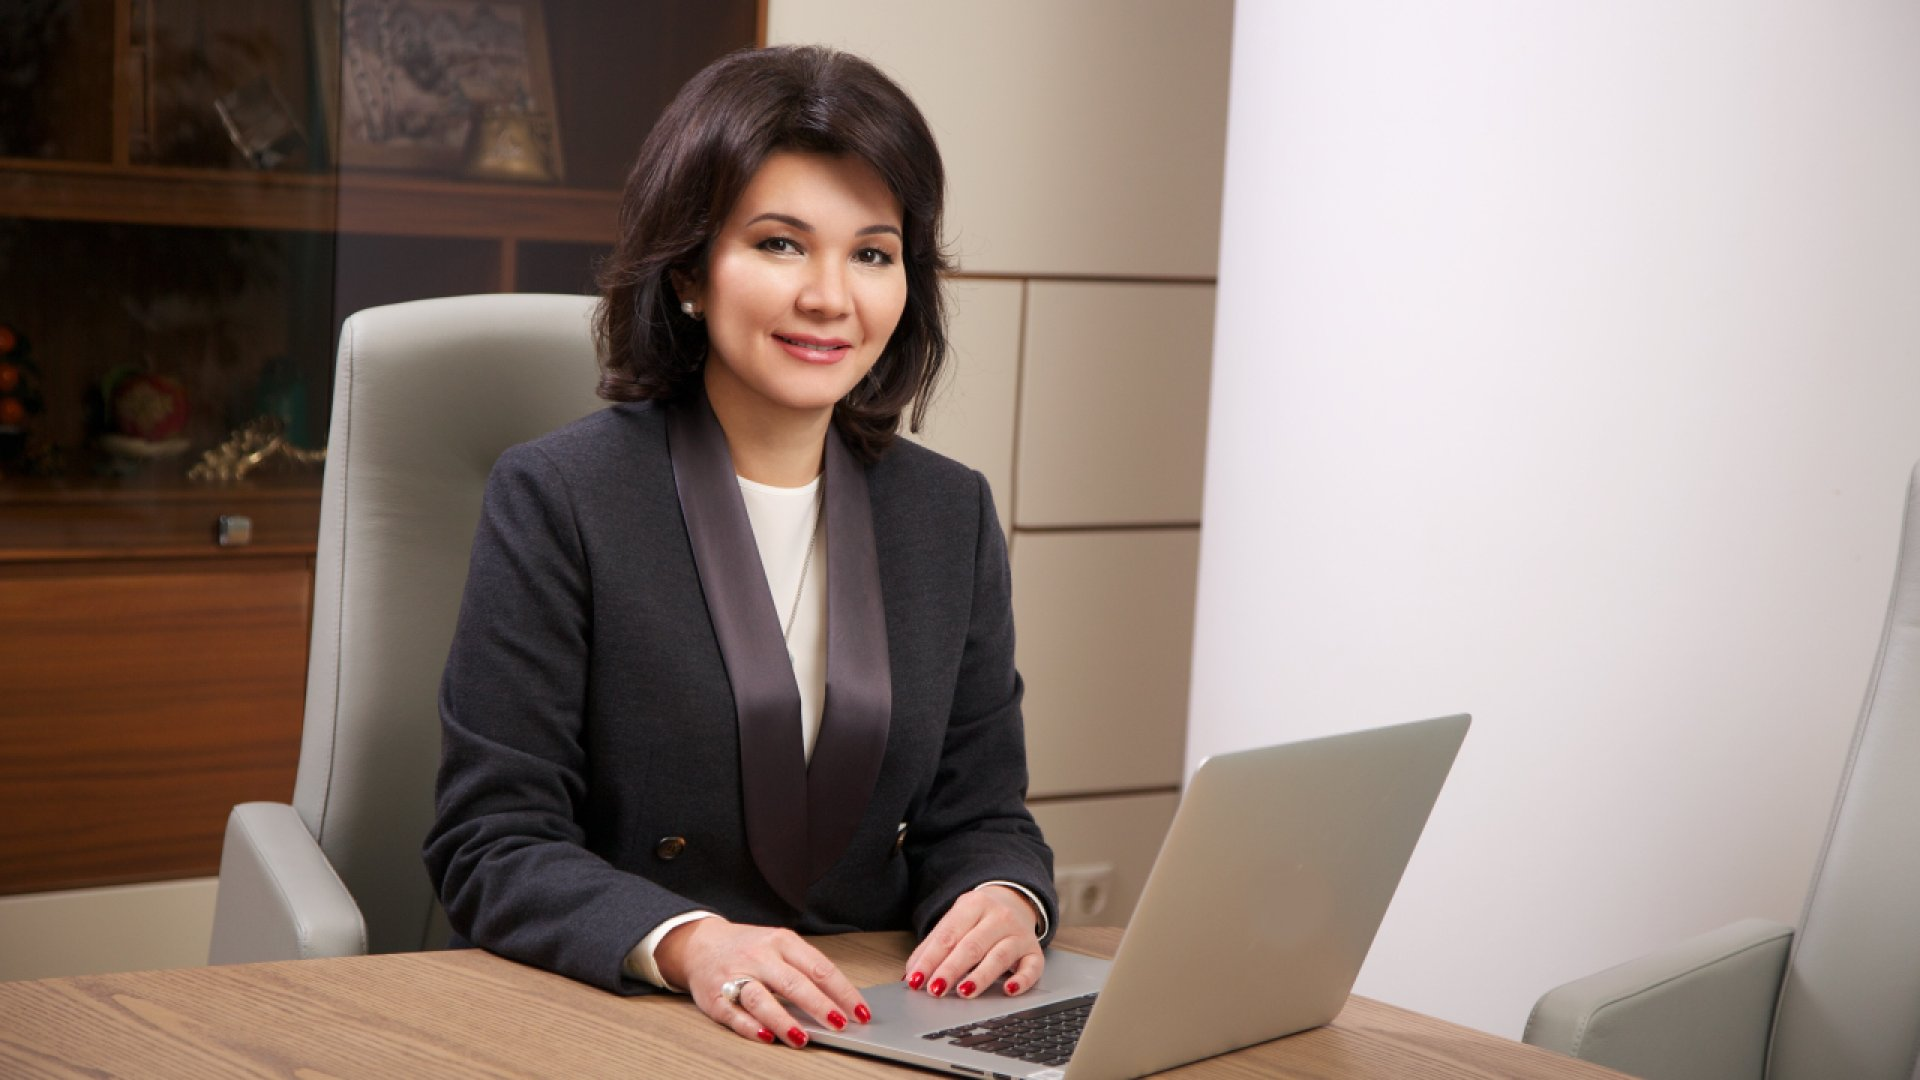 Халык банк кредиты онлайн заявка тинькофф кредит заявка онлайн